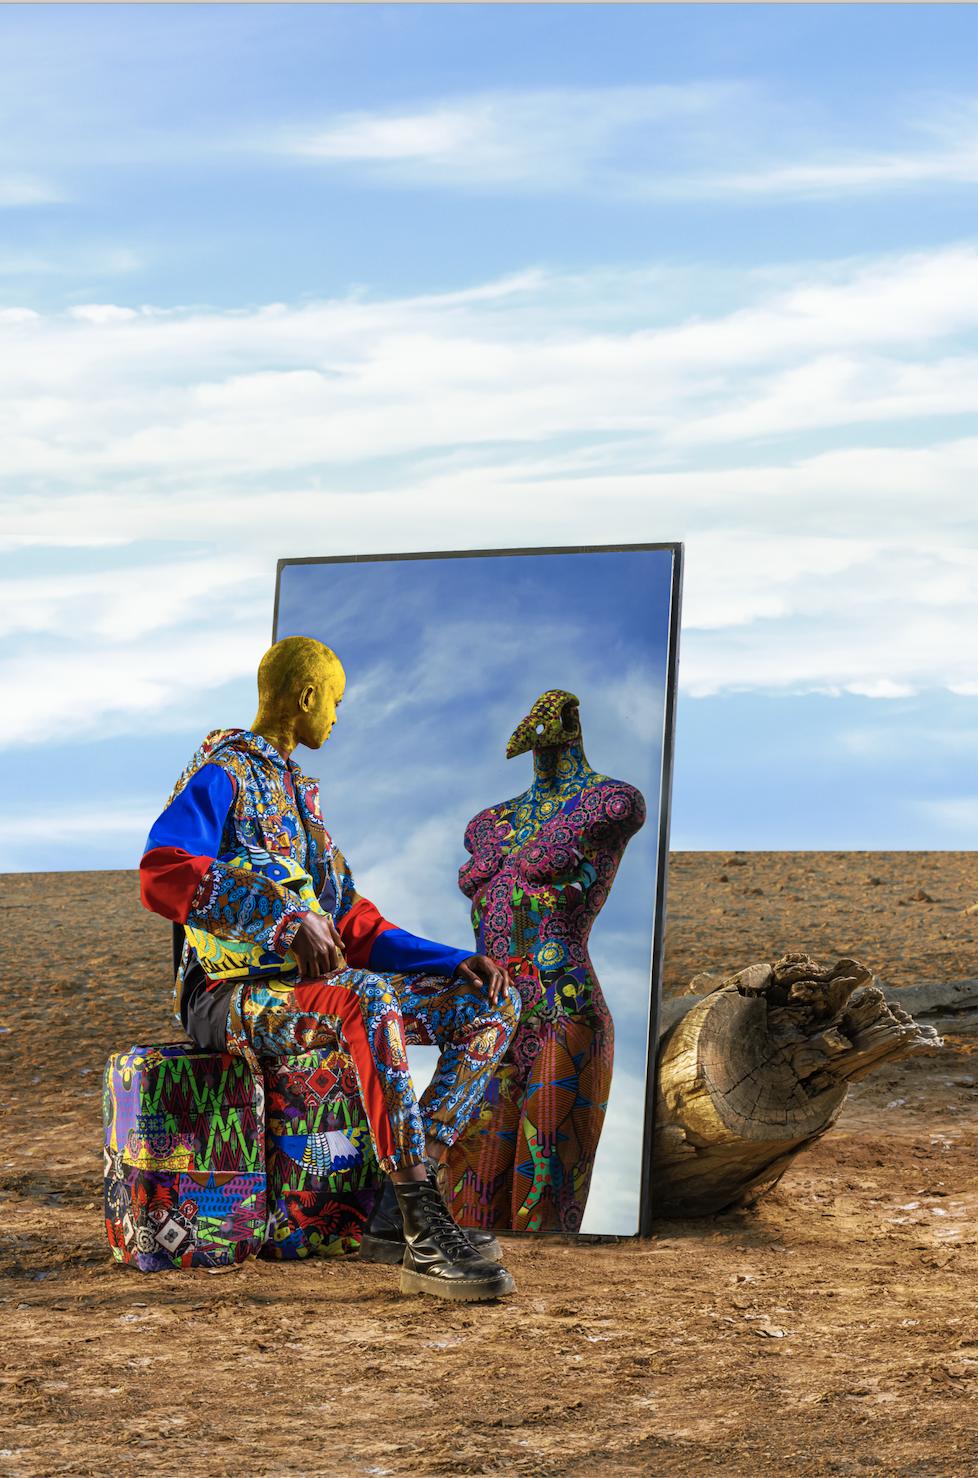 NYAMBO MASAMARA. The Seer. 2021.